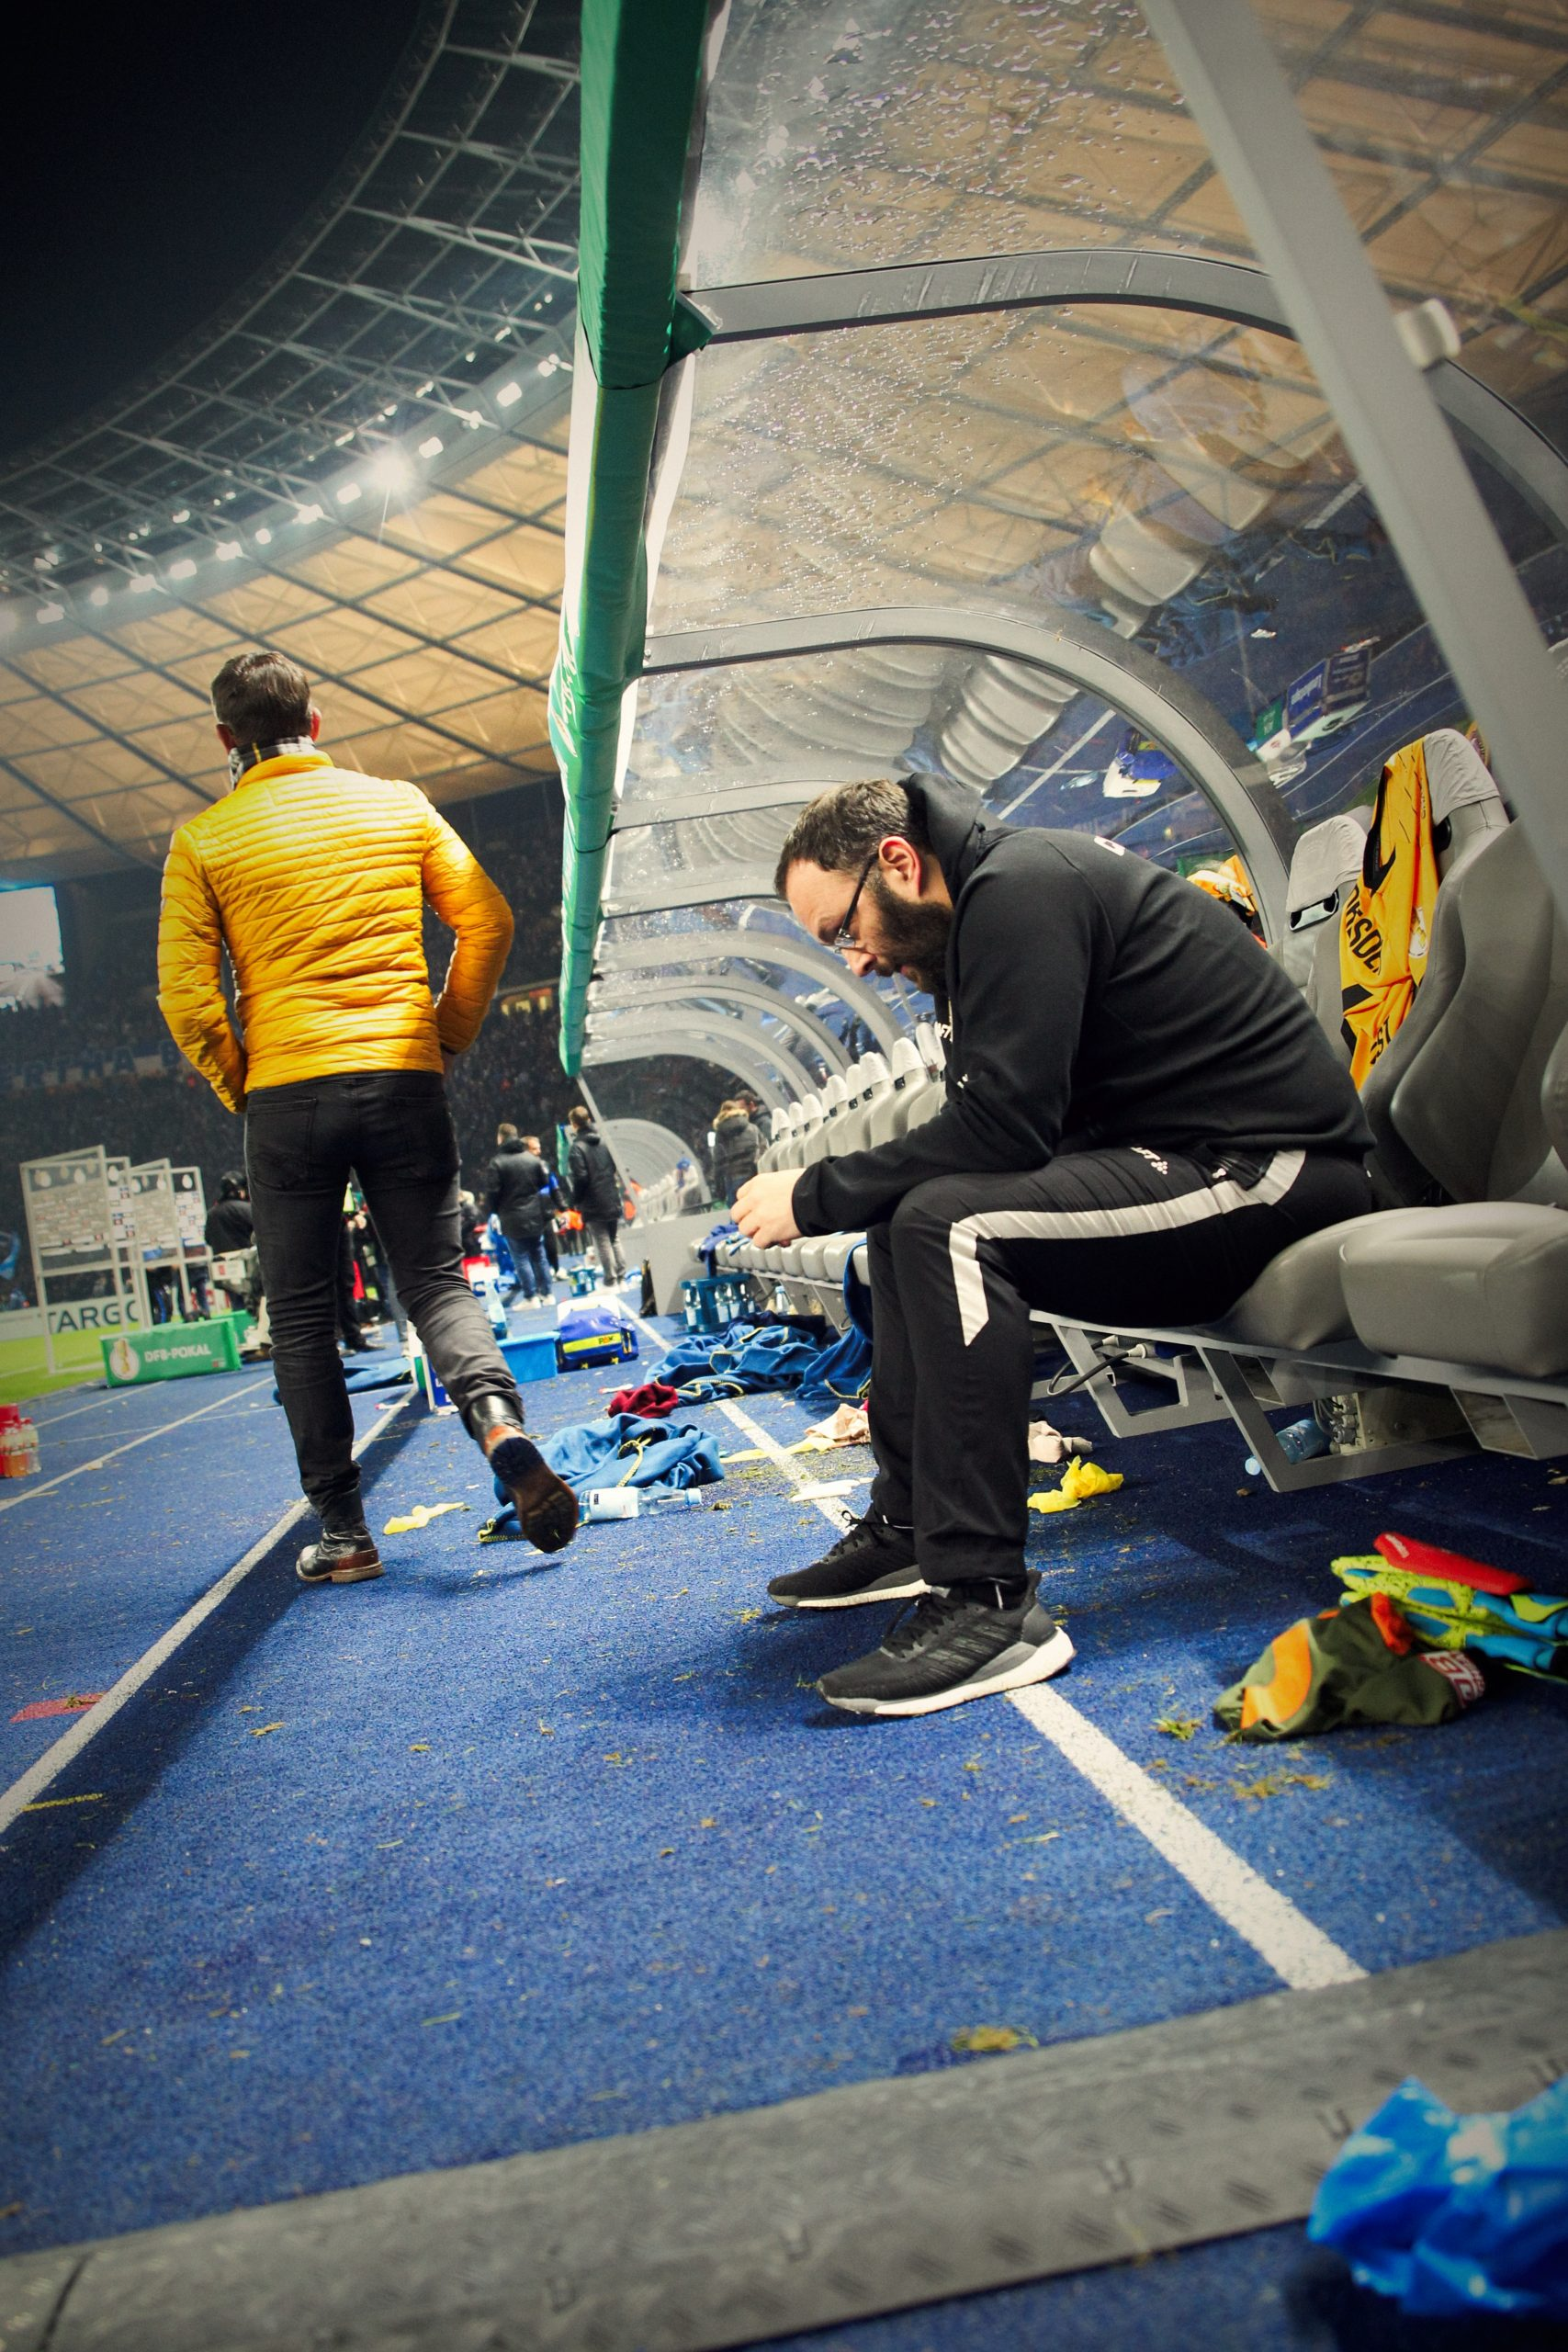 19-20 Pokal - Hertha BSC vs. SG Dynamo Dresden